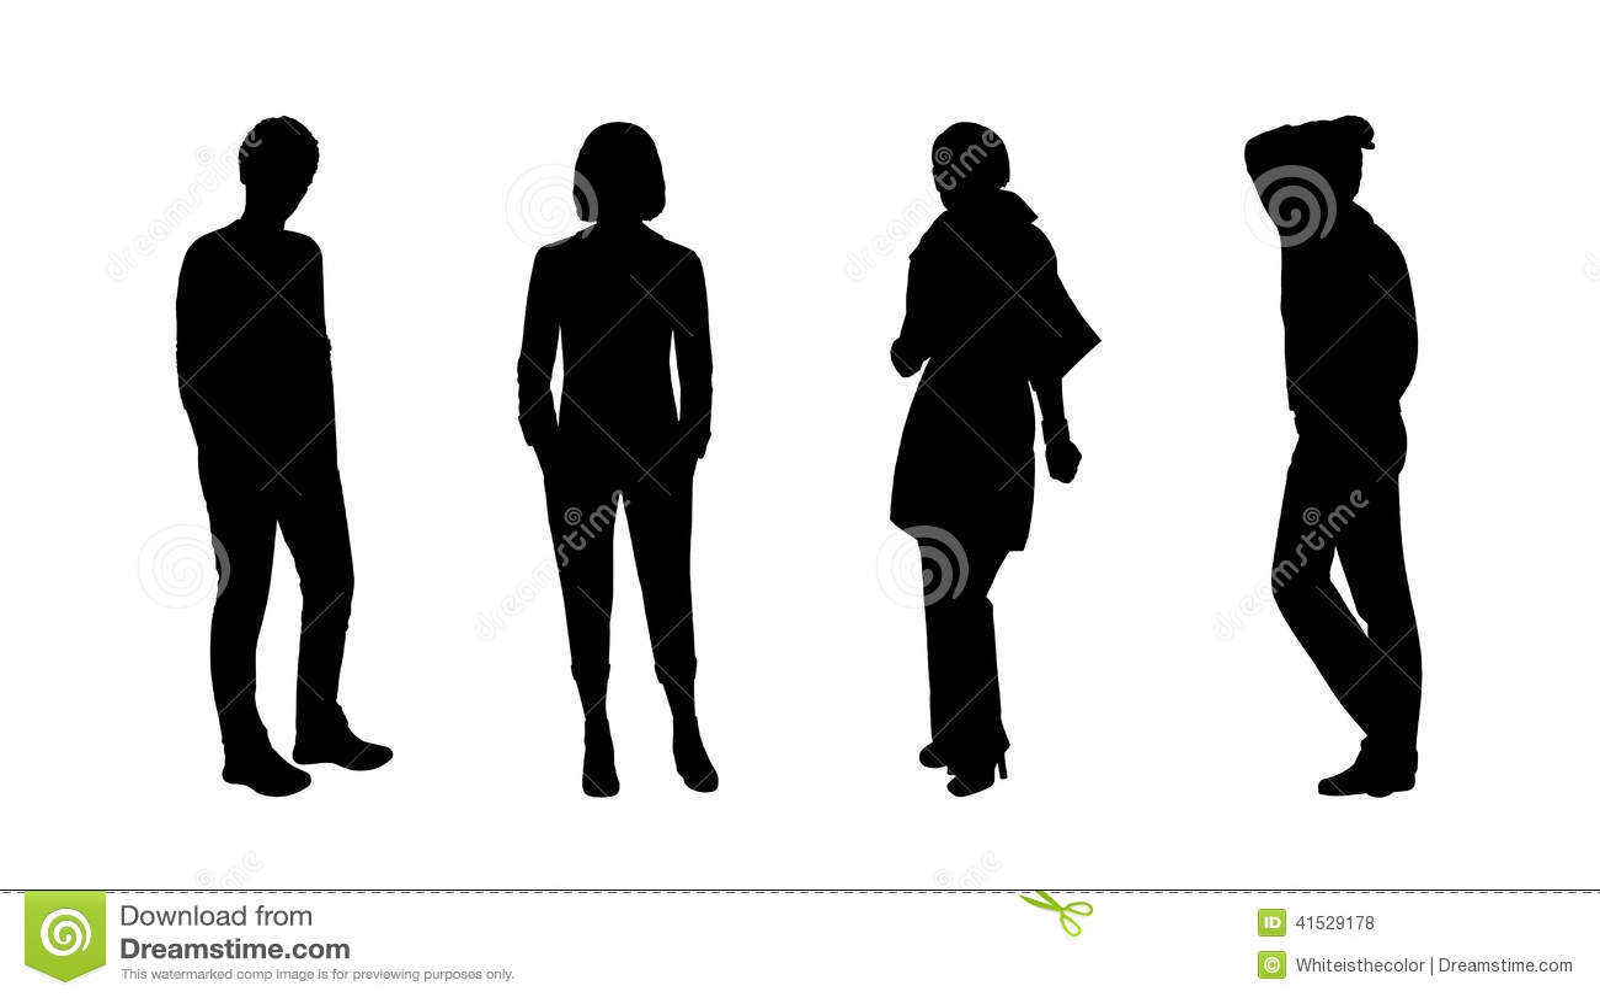 nude black woman standing profile